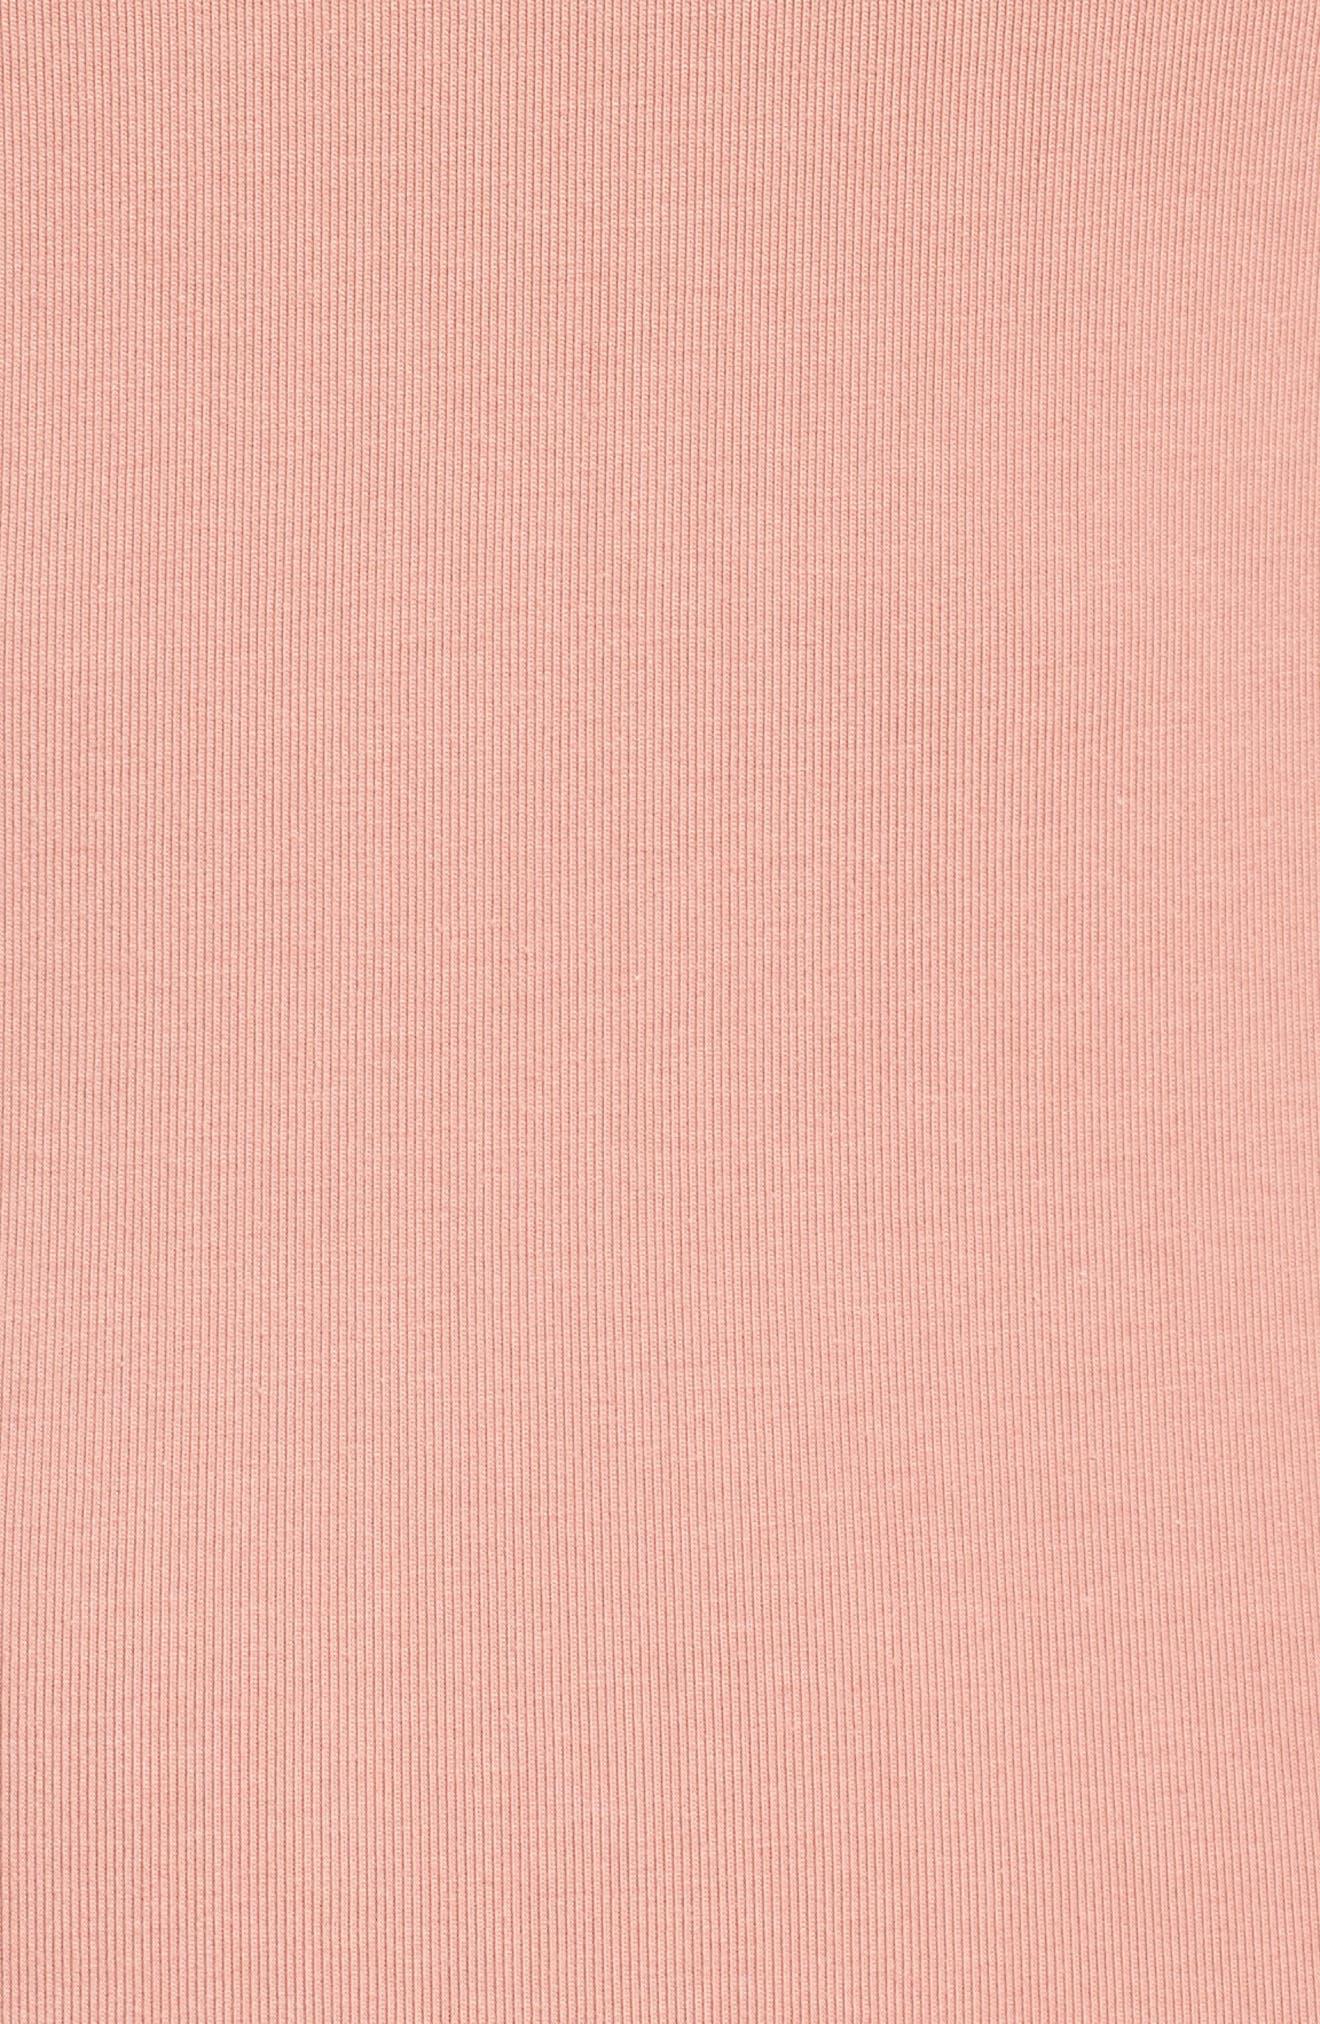 T7 Sweatshirt Dress,                             Alternate thumbnail 21, color,